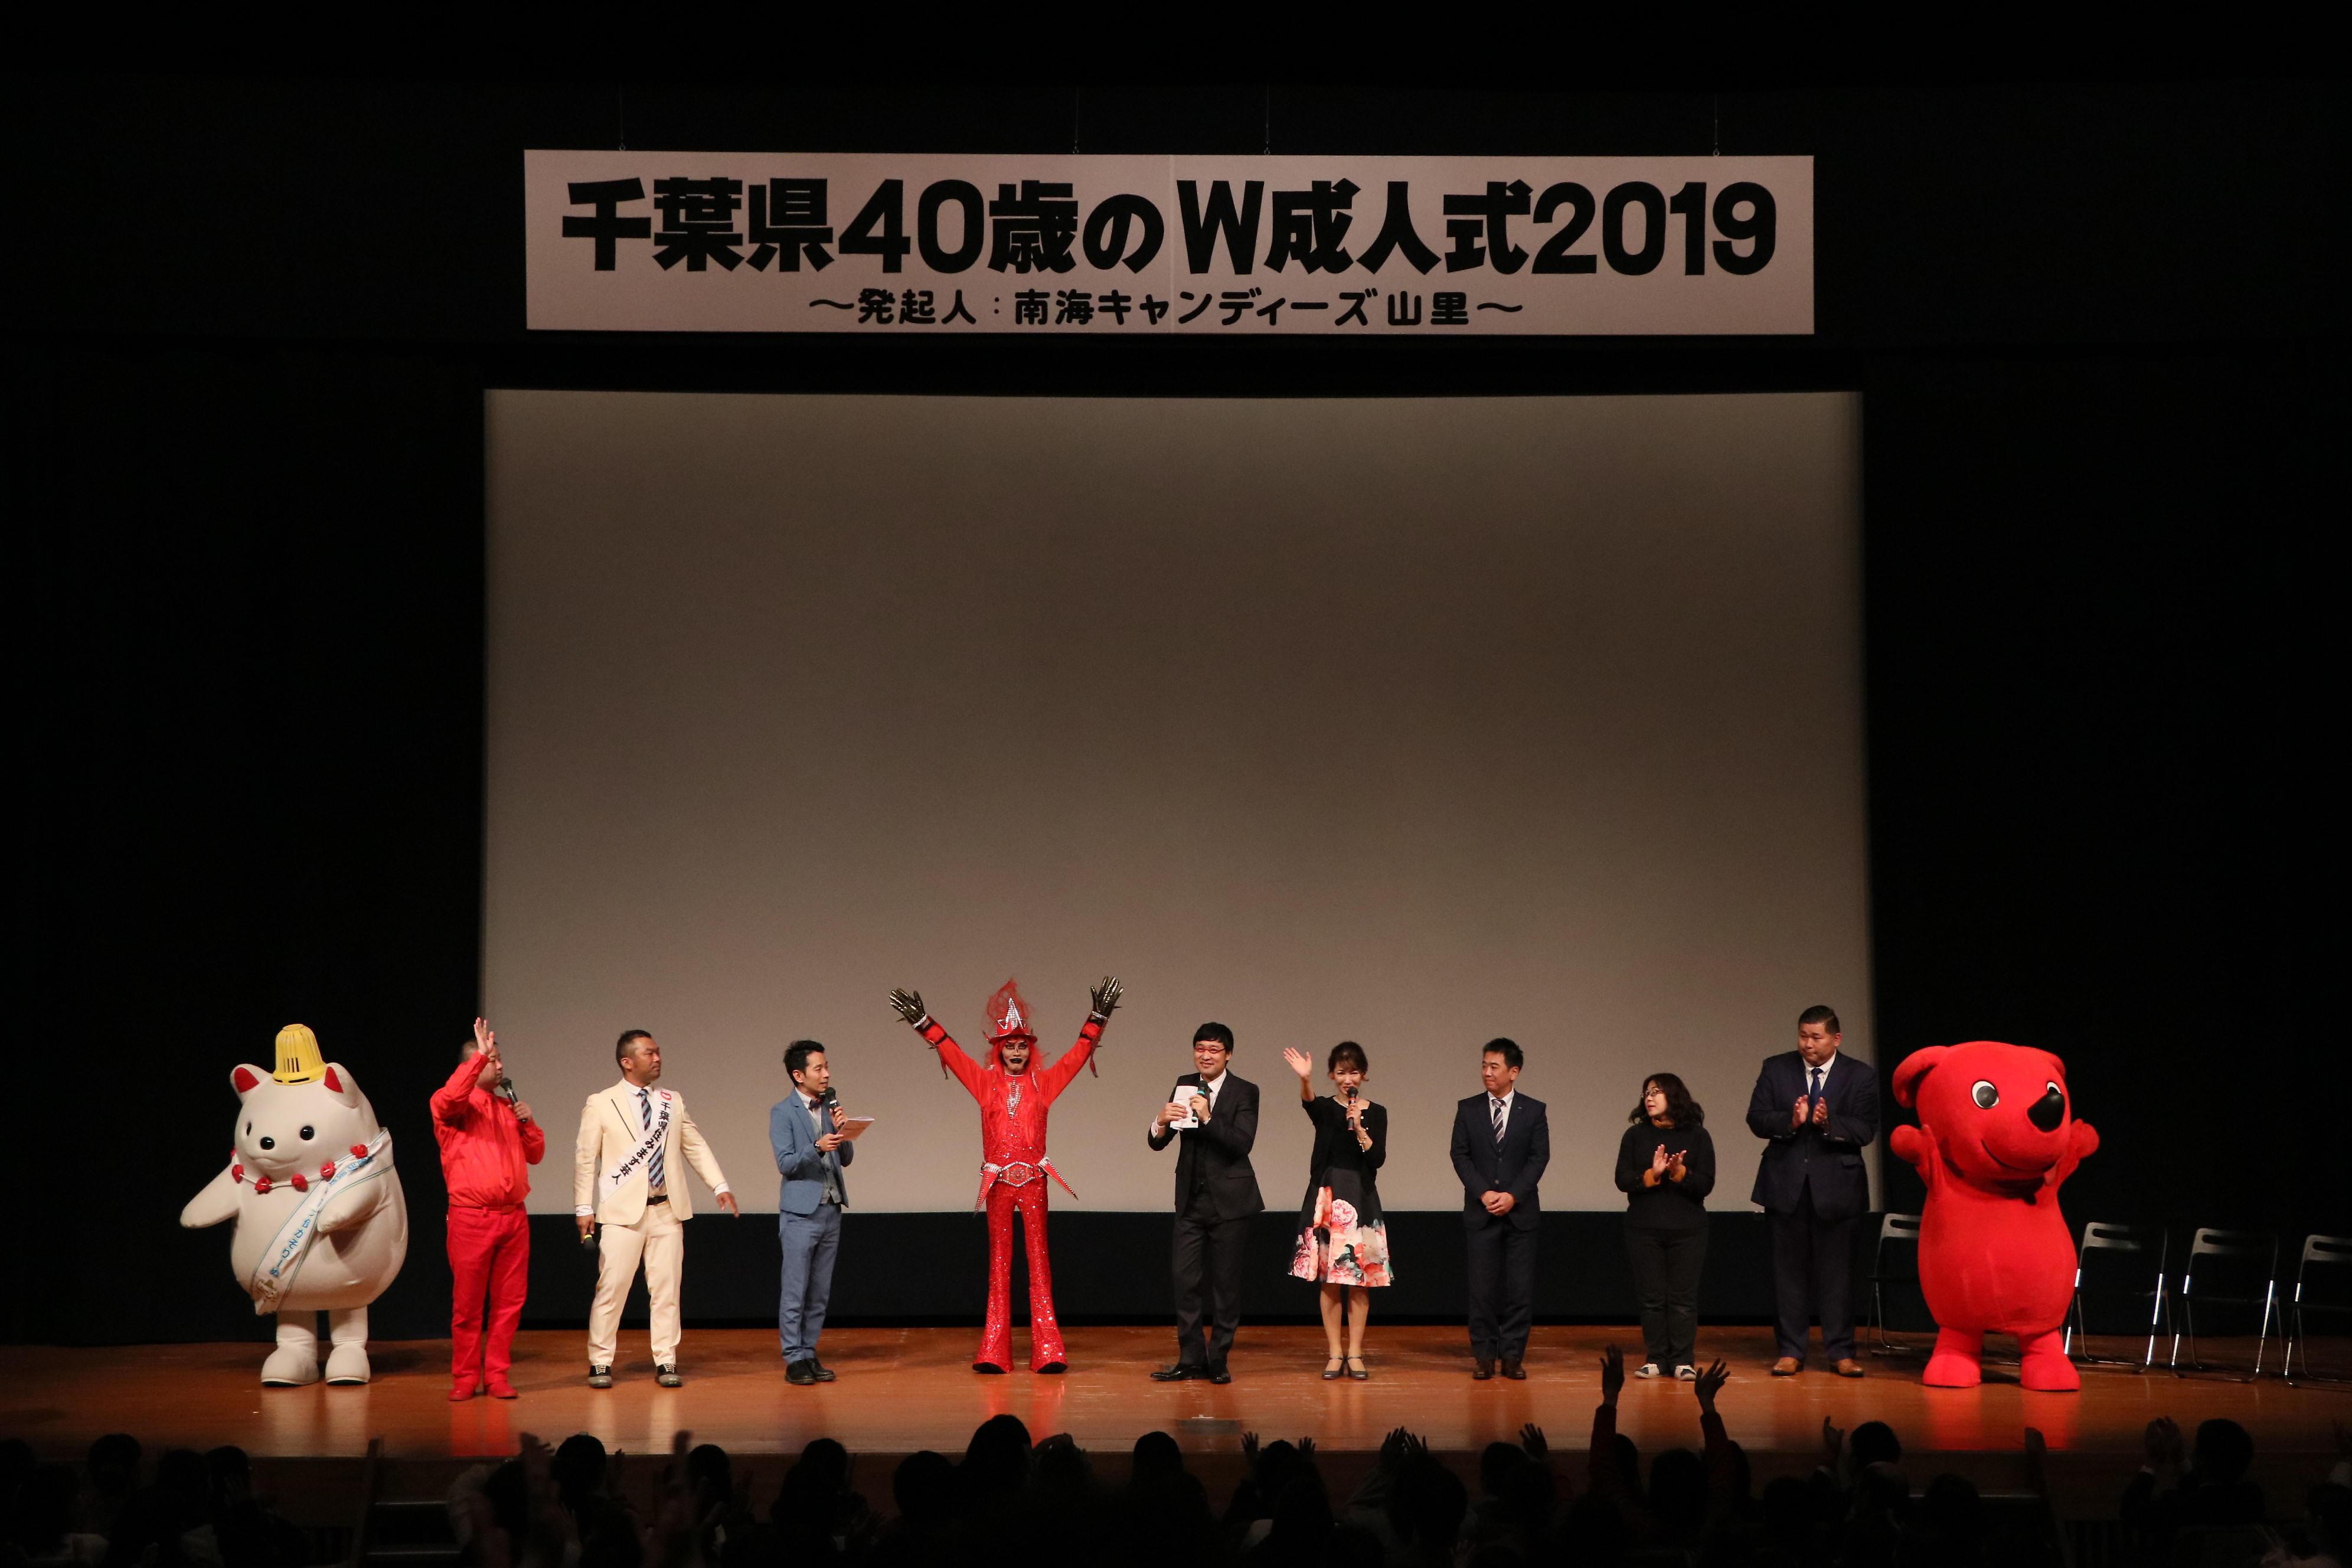 http://news.yoshimoto.co.jp/20190106222746-0646e39aeea171a5be4b8018e1e6b9fc626b4c28.jpg